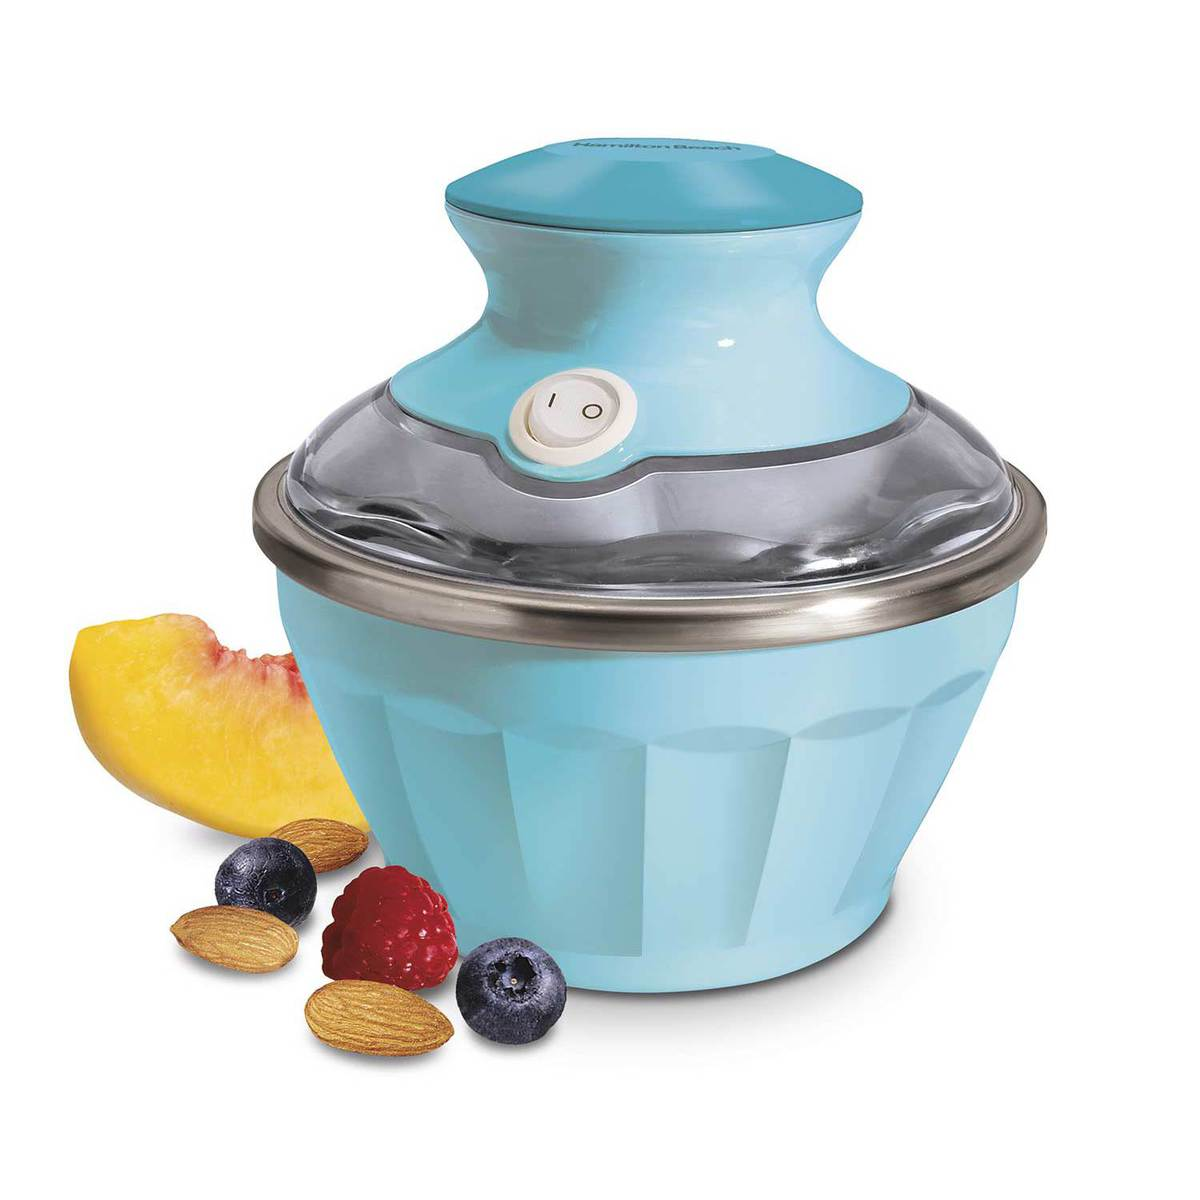 Cordless Half Pint Soft-Serve Ice Cream Maker (68661)